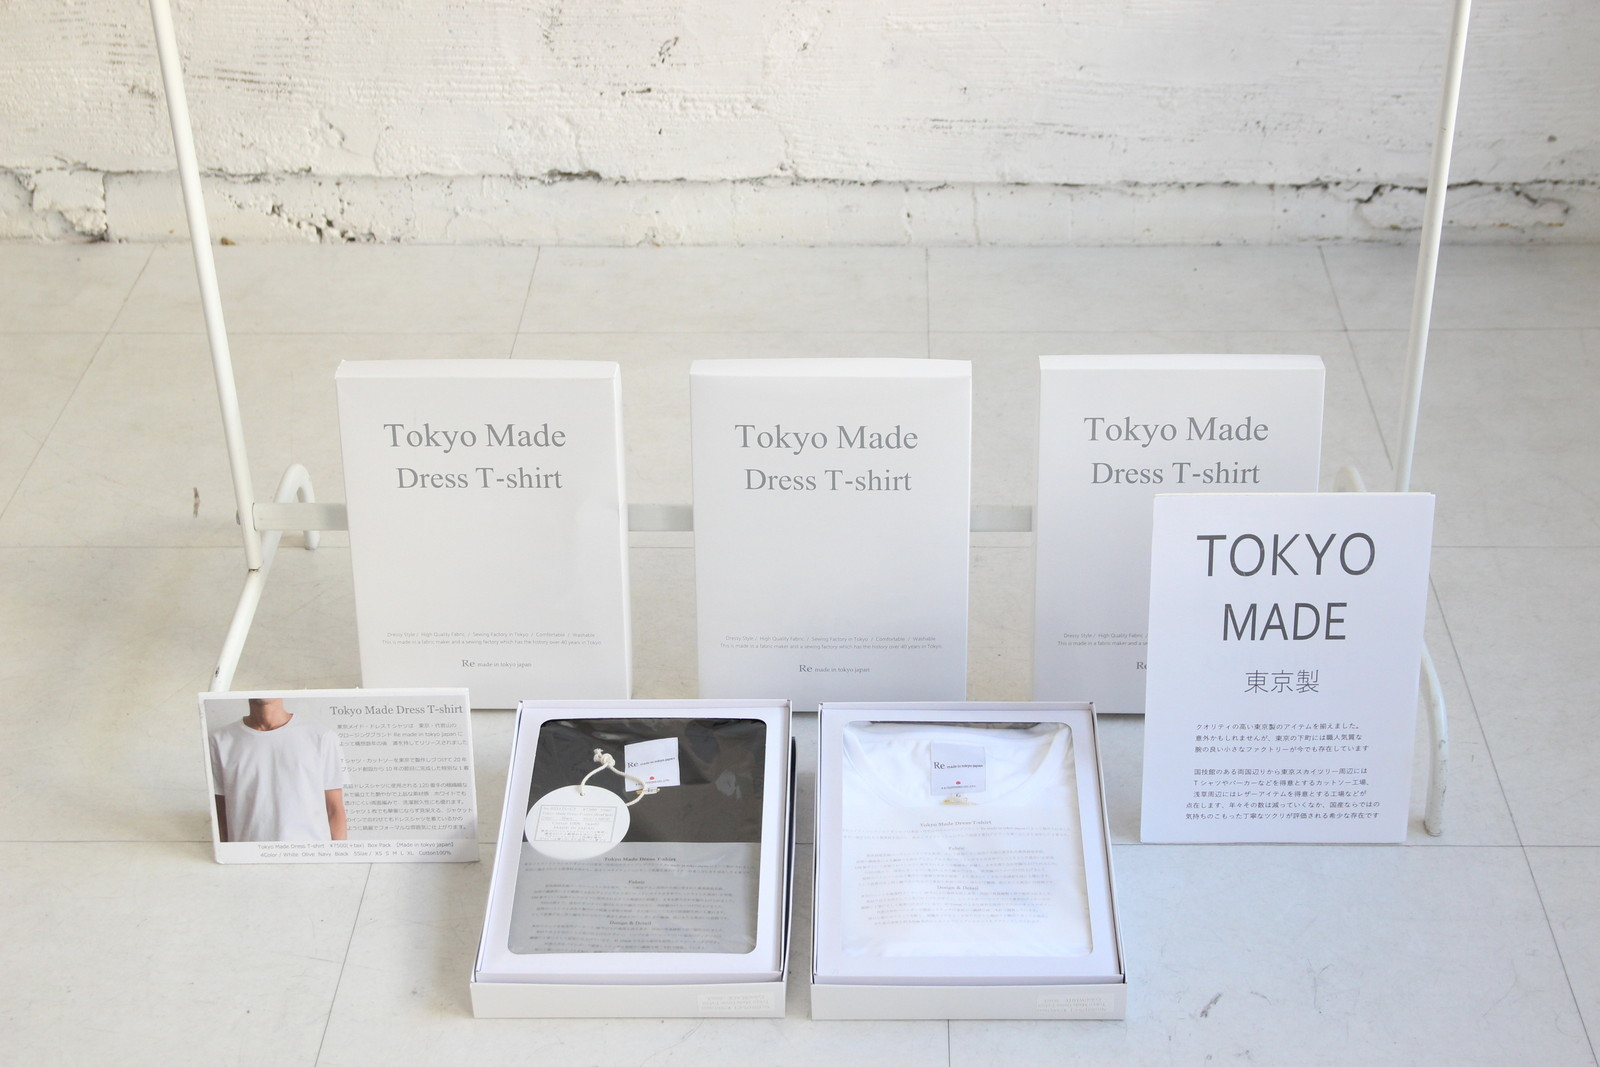 Tokyo Made Dress T-shirt (V-neck)_c0379477_14194291.jpg